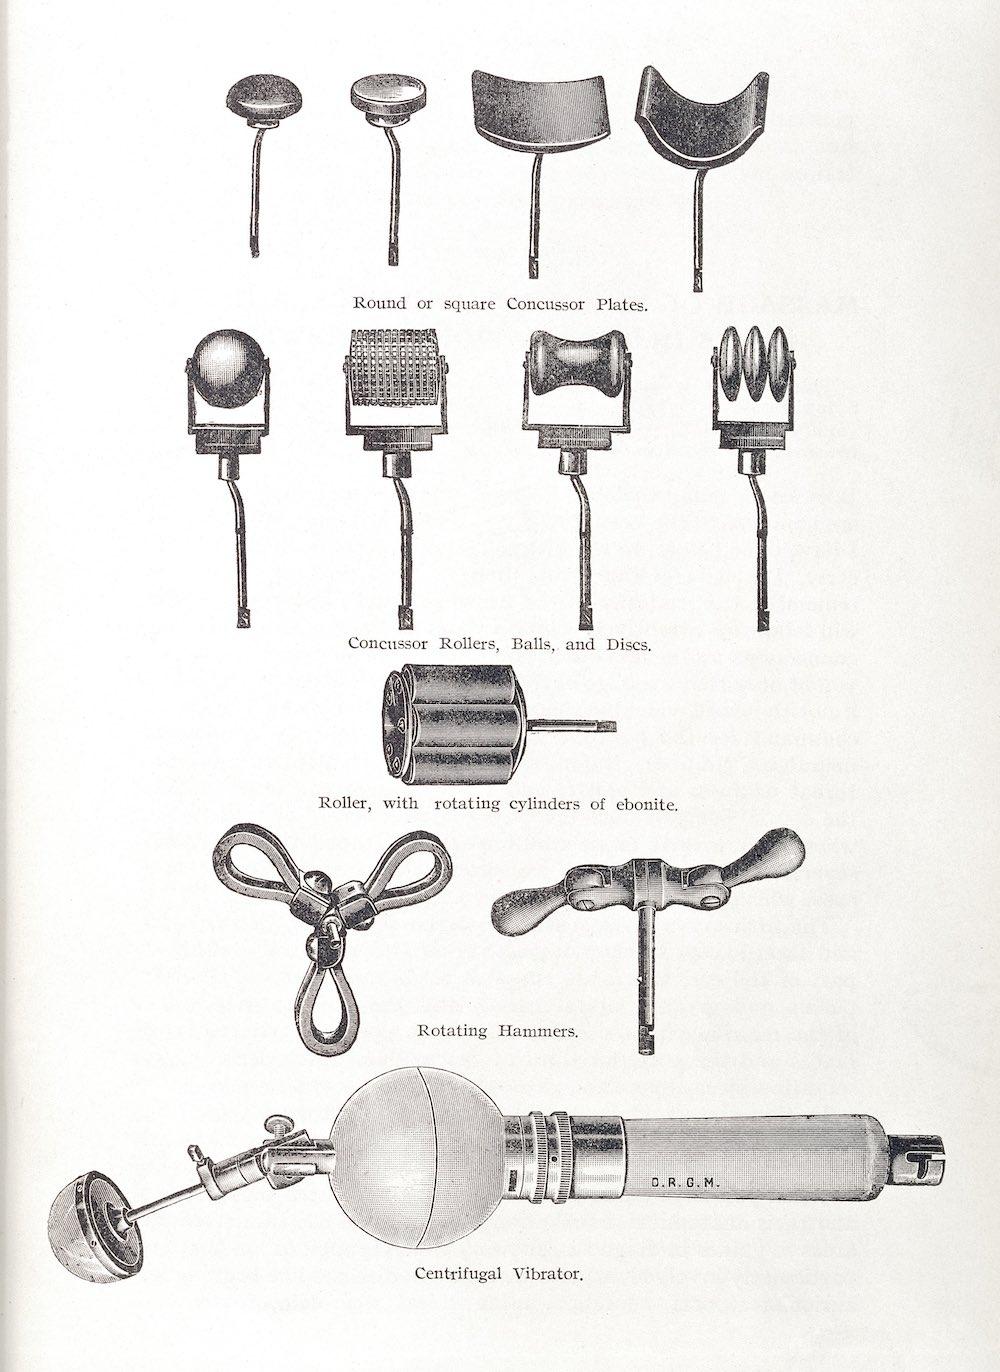 L0034214 Illustration showing various instruments